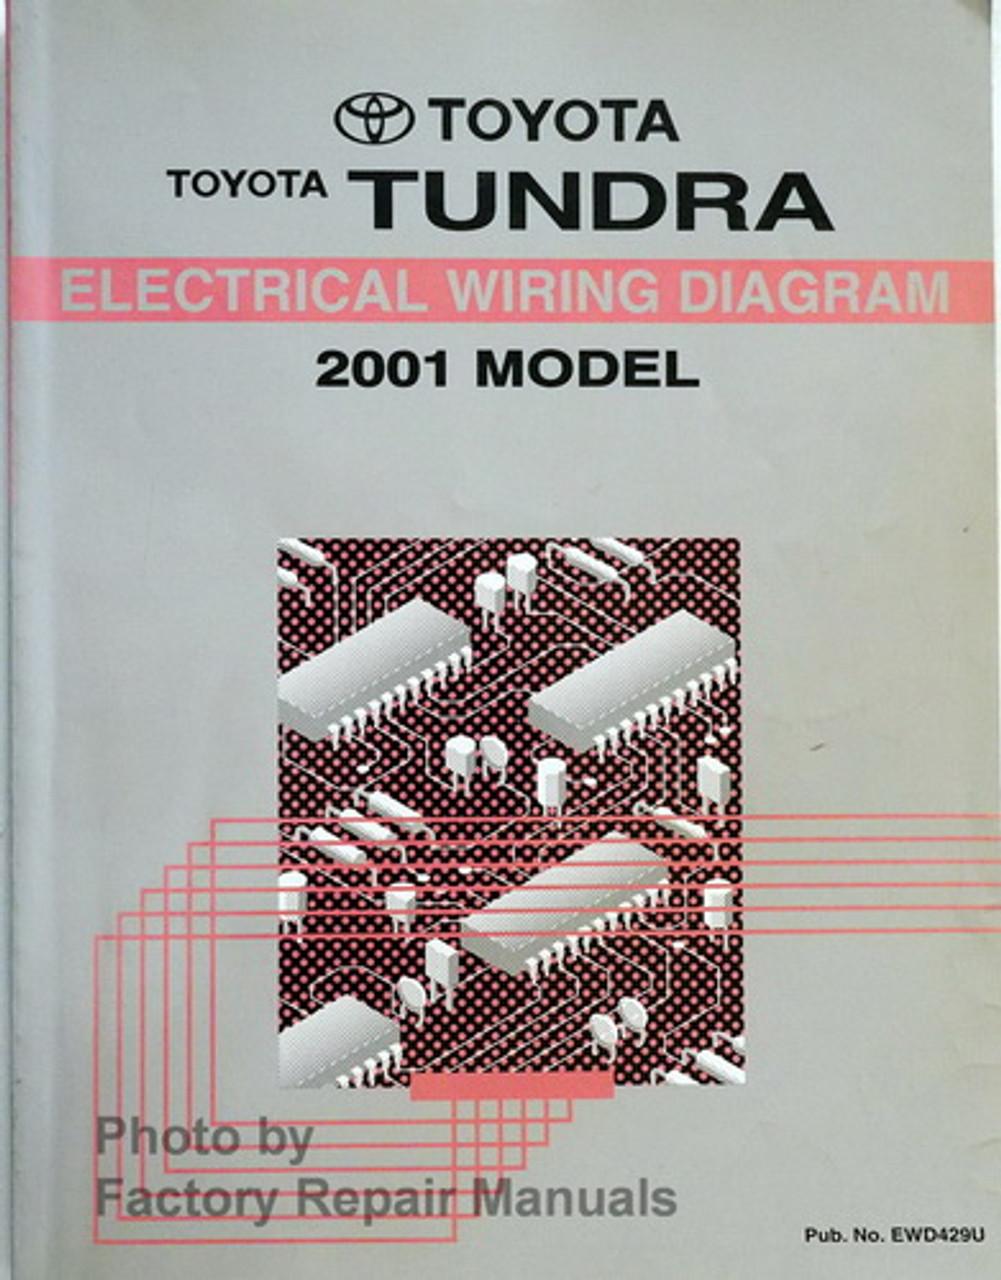 2001 Toyota Tundra Parts Diagram Wiring Schematic Wiring Diagrams Site Popular A Popular A Geasparquet It